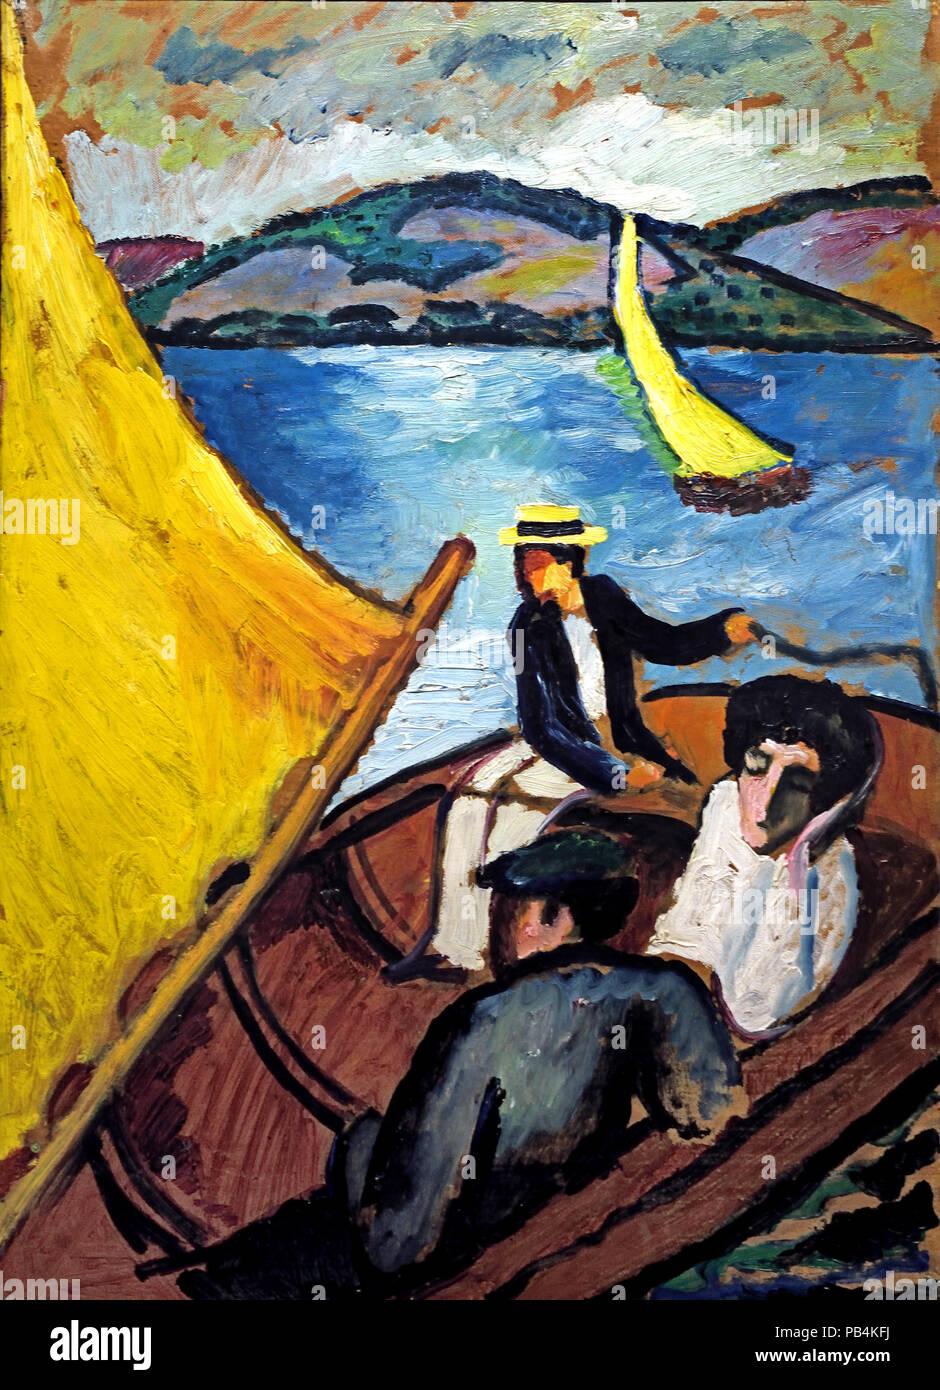 Yachting sul lago Tegern 1910 August Macke 1887-1914 il tedesco in Germania Immagini Stock